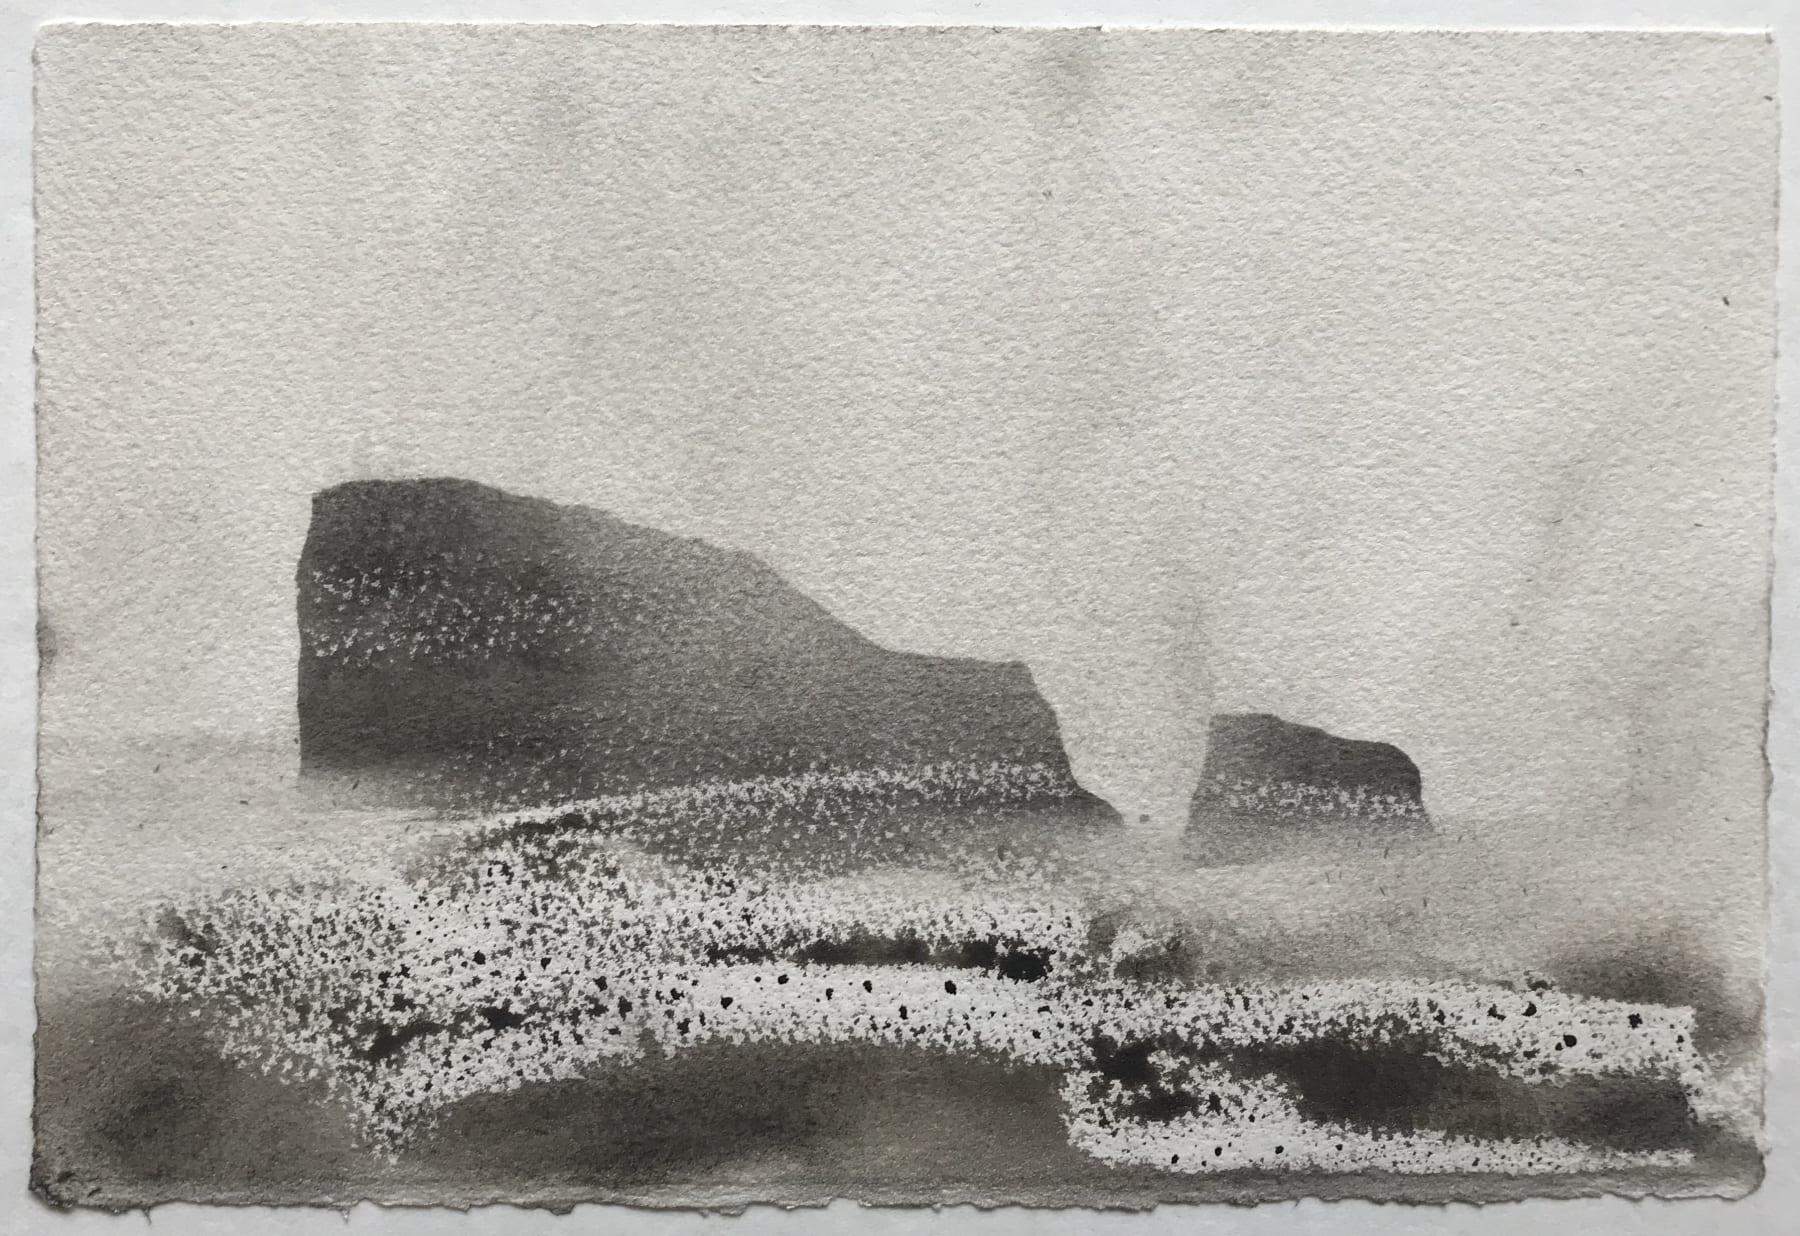 Jason Hicklin, East Tump, Grassholm Island, 2020